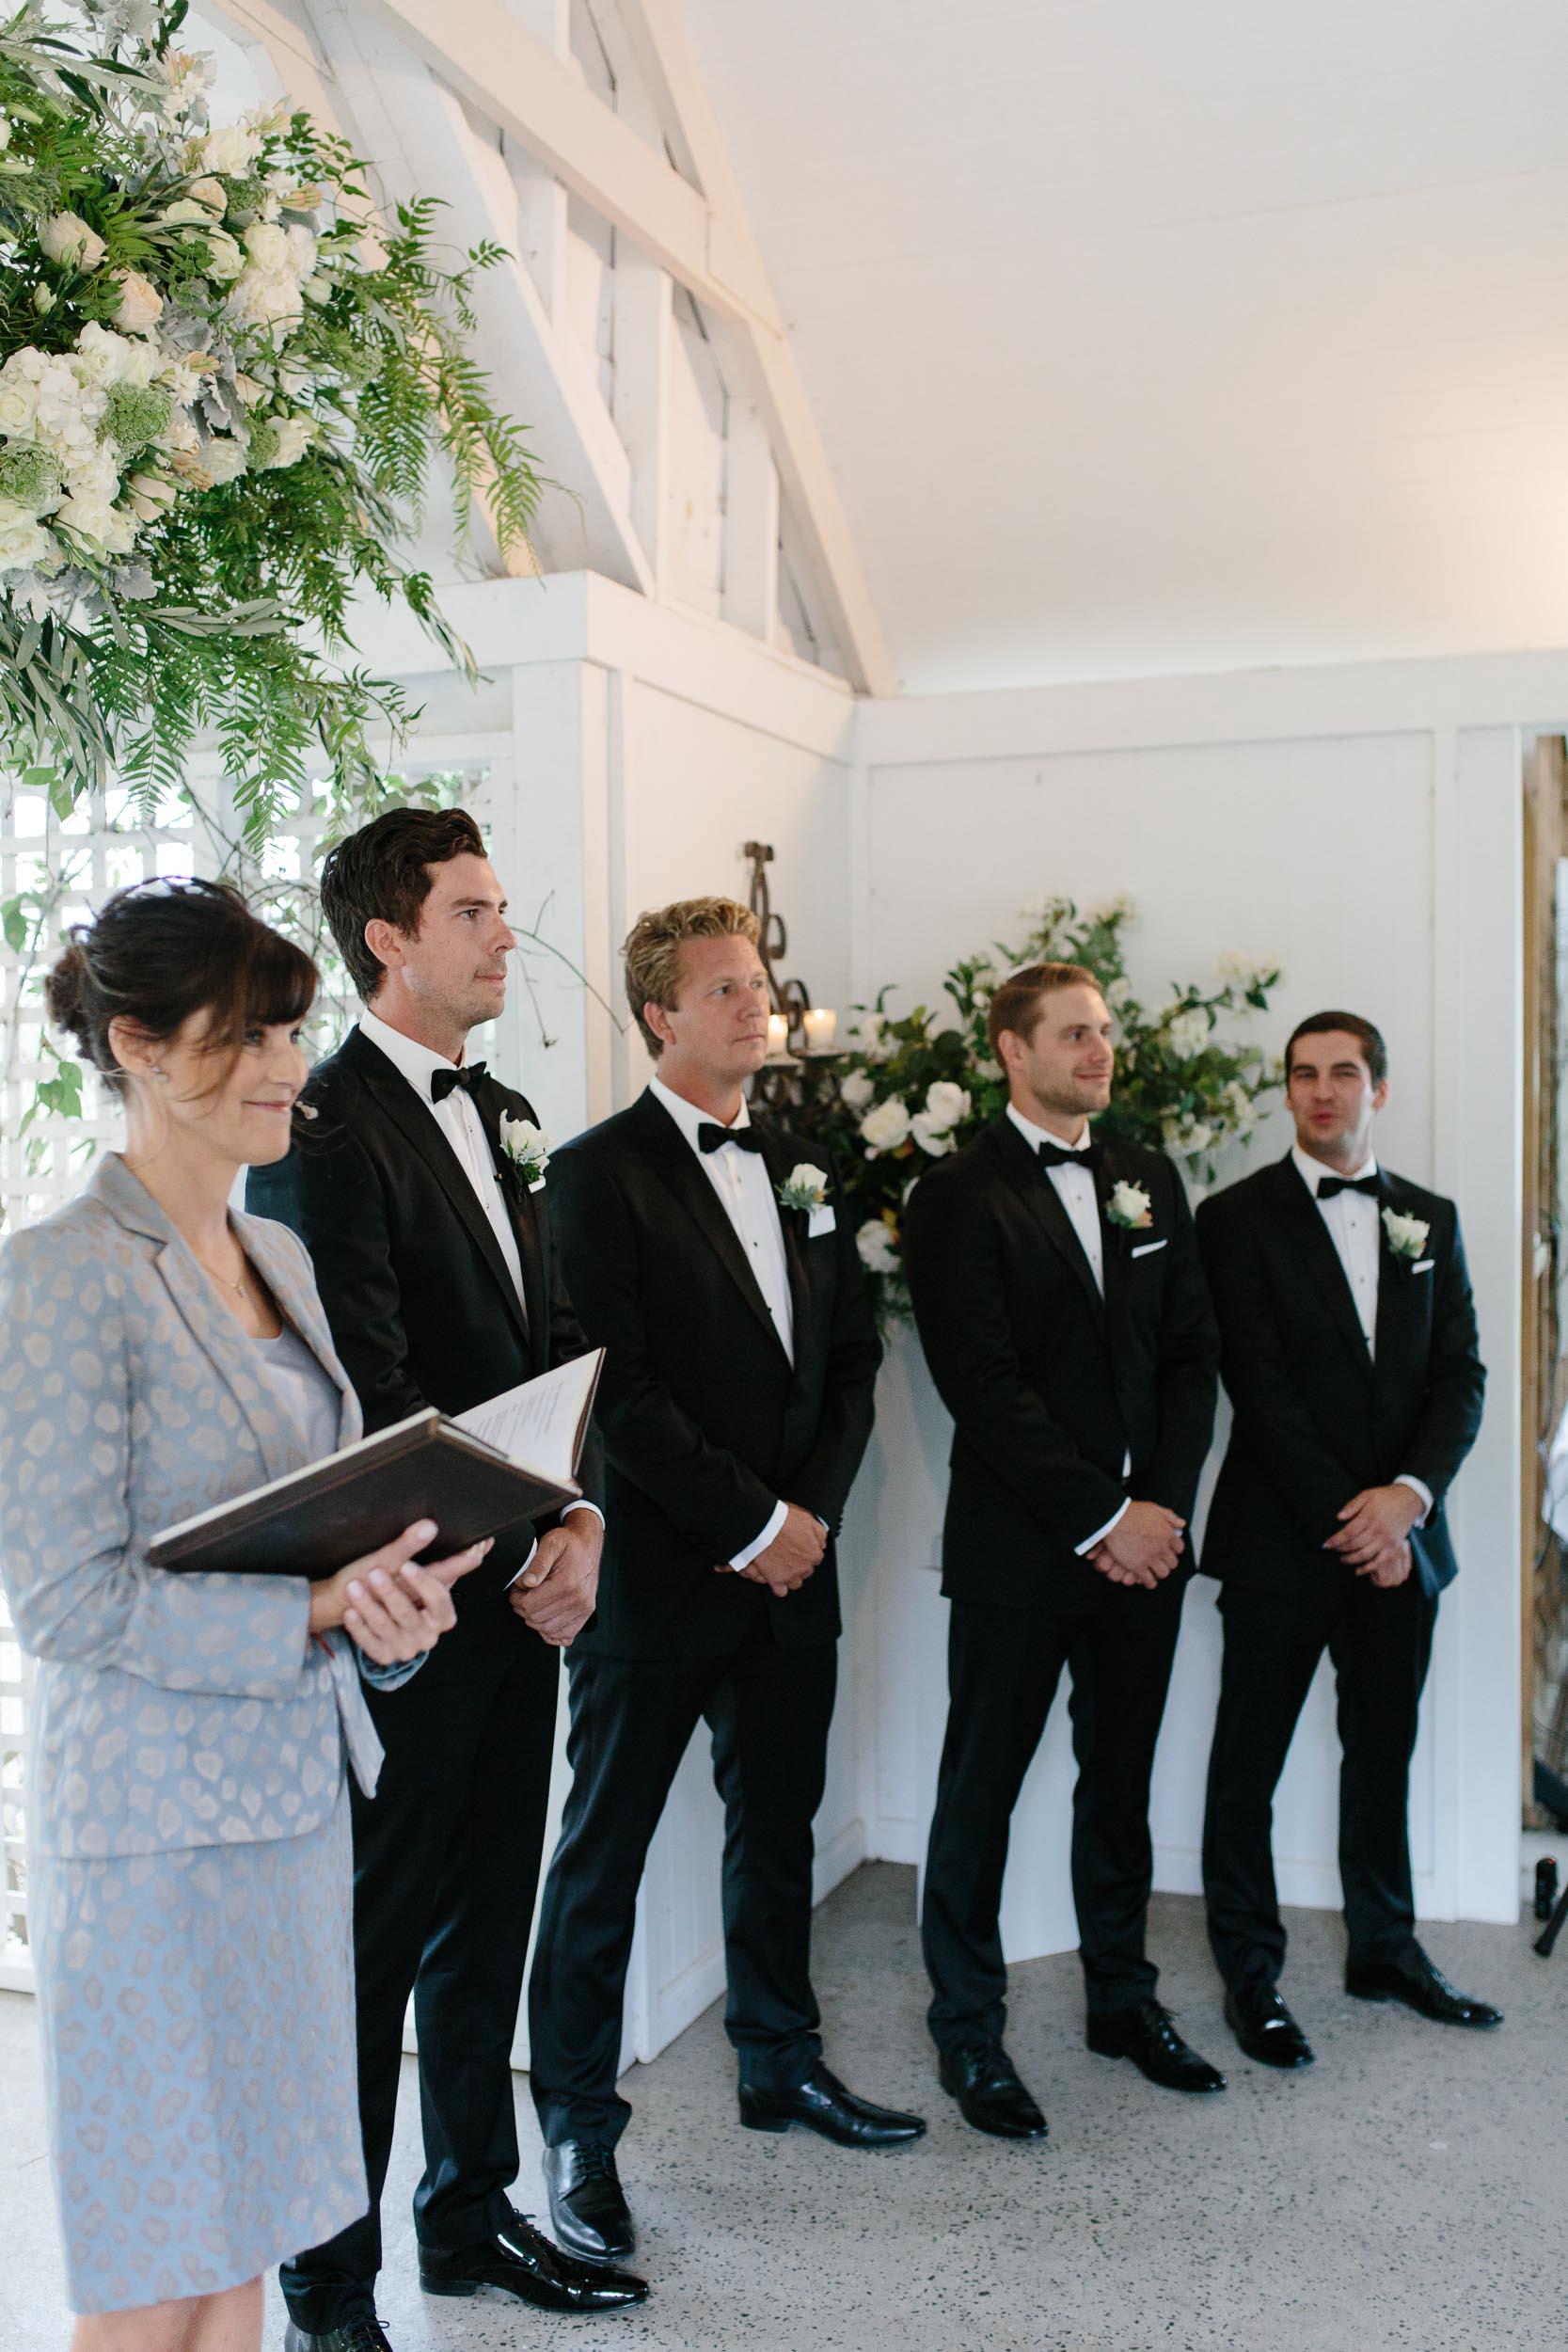 Kas-Richards-Mornington-Peninsula-Private-Property-Wedding-Marianna-Hardwick-Gown-203.jpg